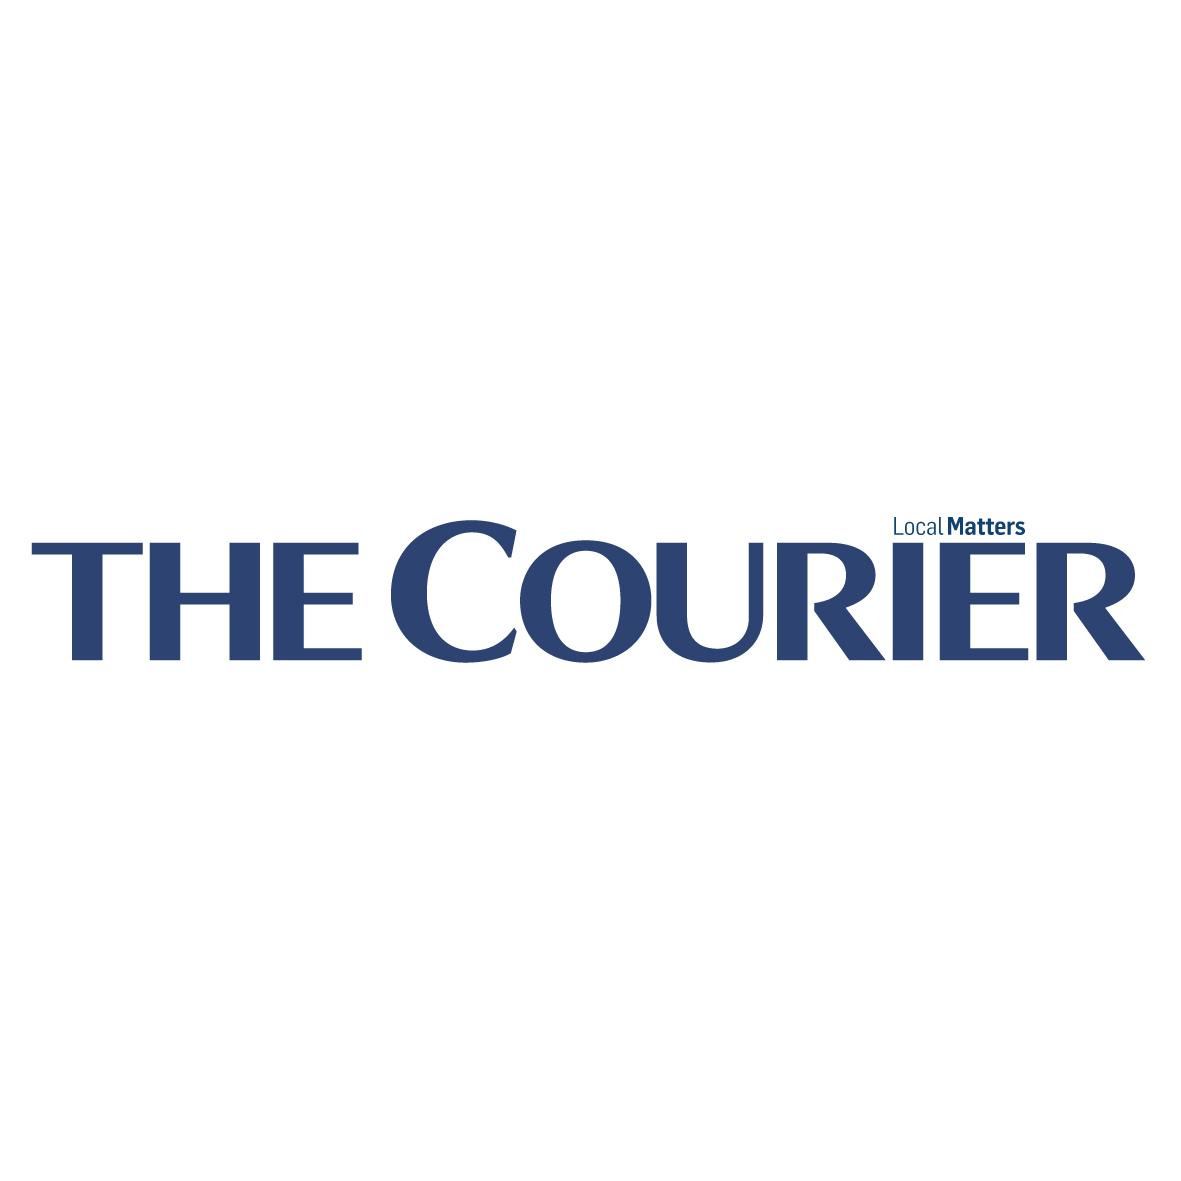 Media job: Deputy news editor, The Courier